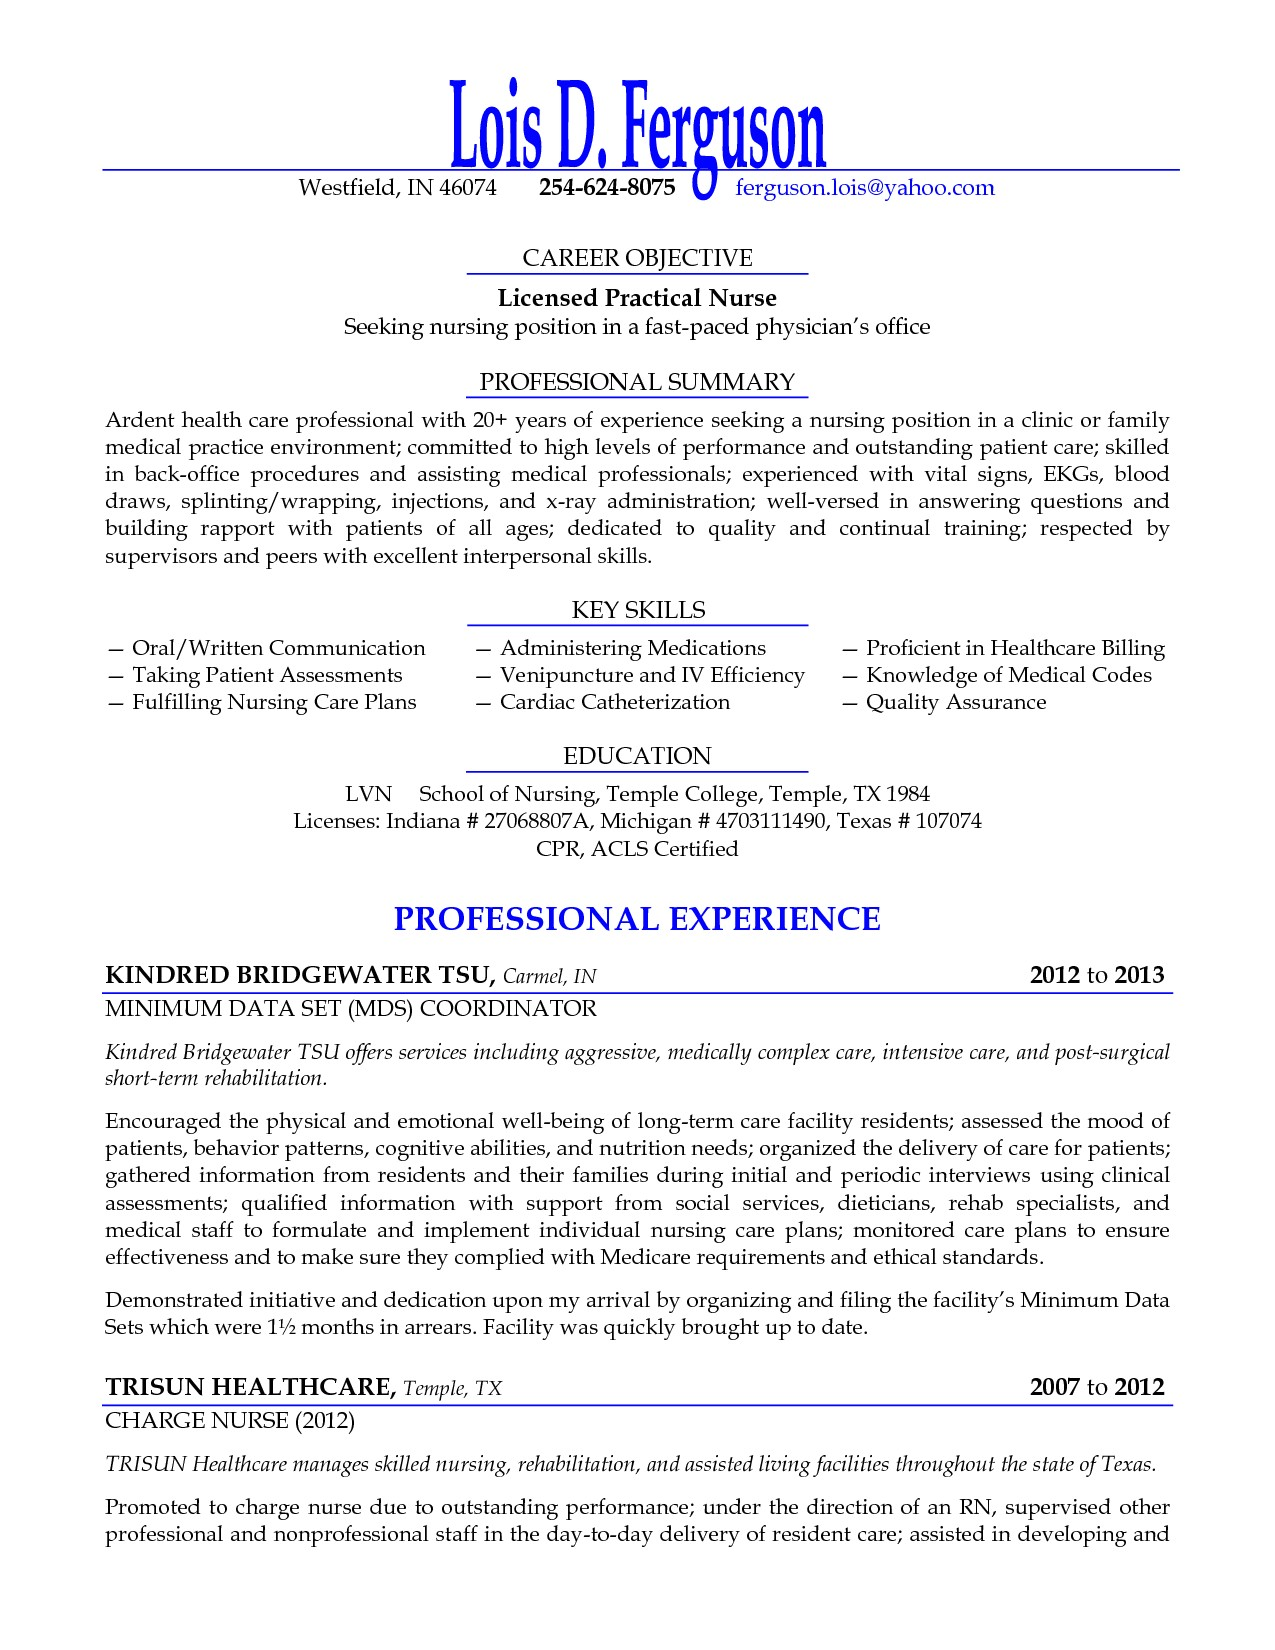 licensed practical nurse seeking nursing position resume objective sample